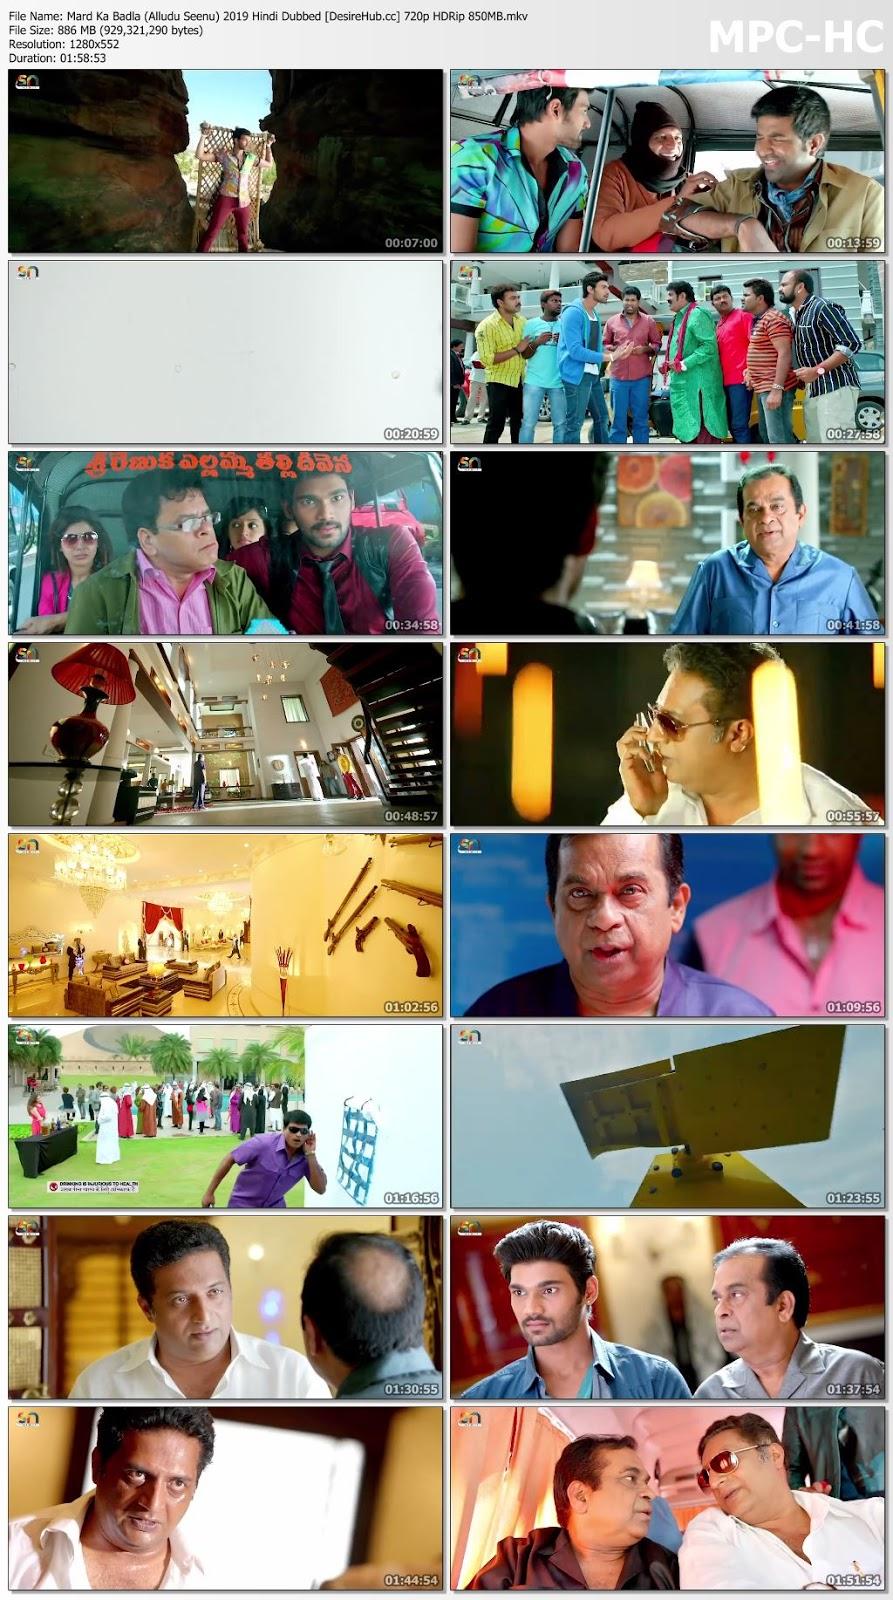 Mard Ka Badla (Alludu Seenu) 2019 Hindi Dubbed 480p HDRip 350MB Desirehub